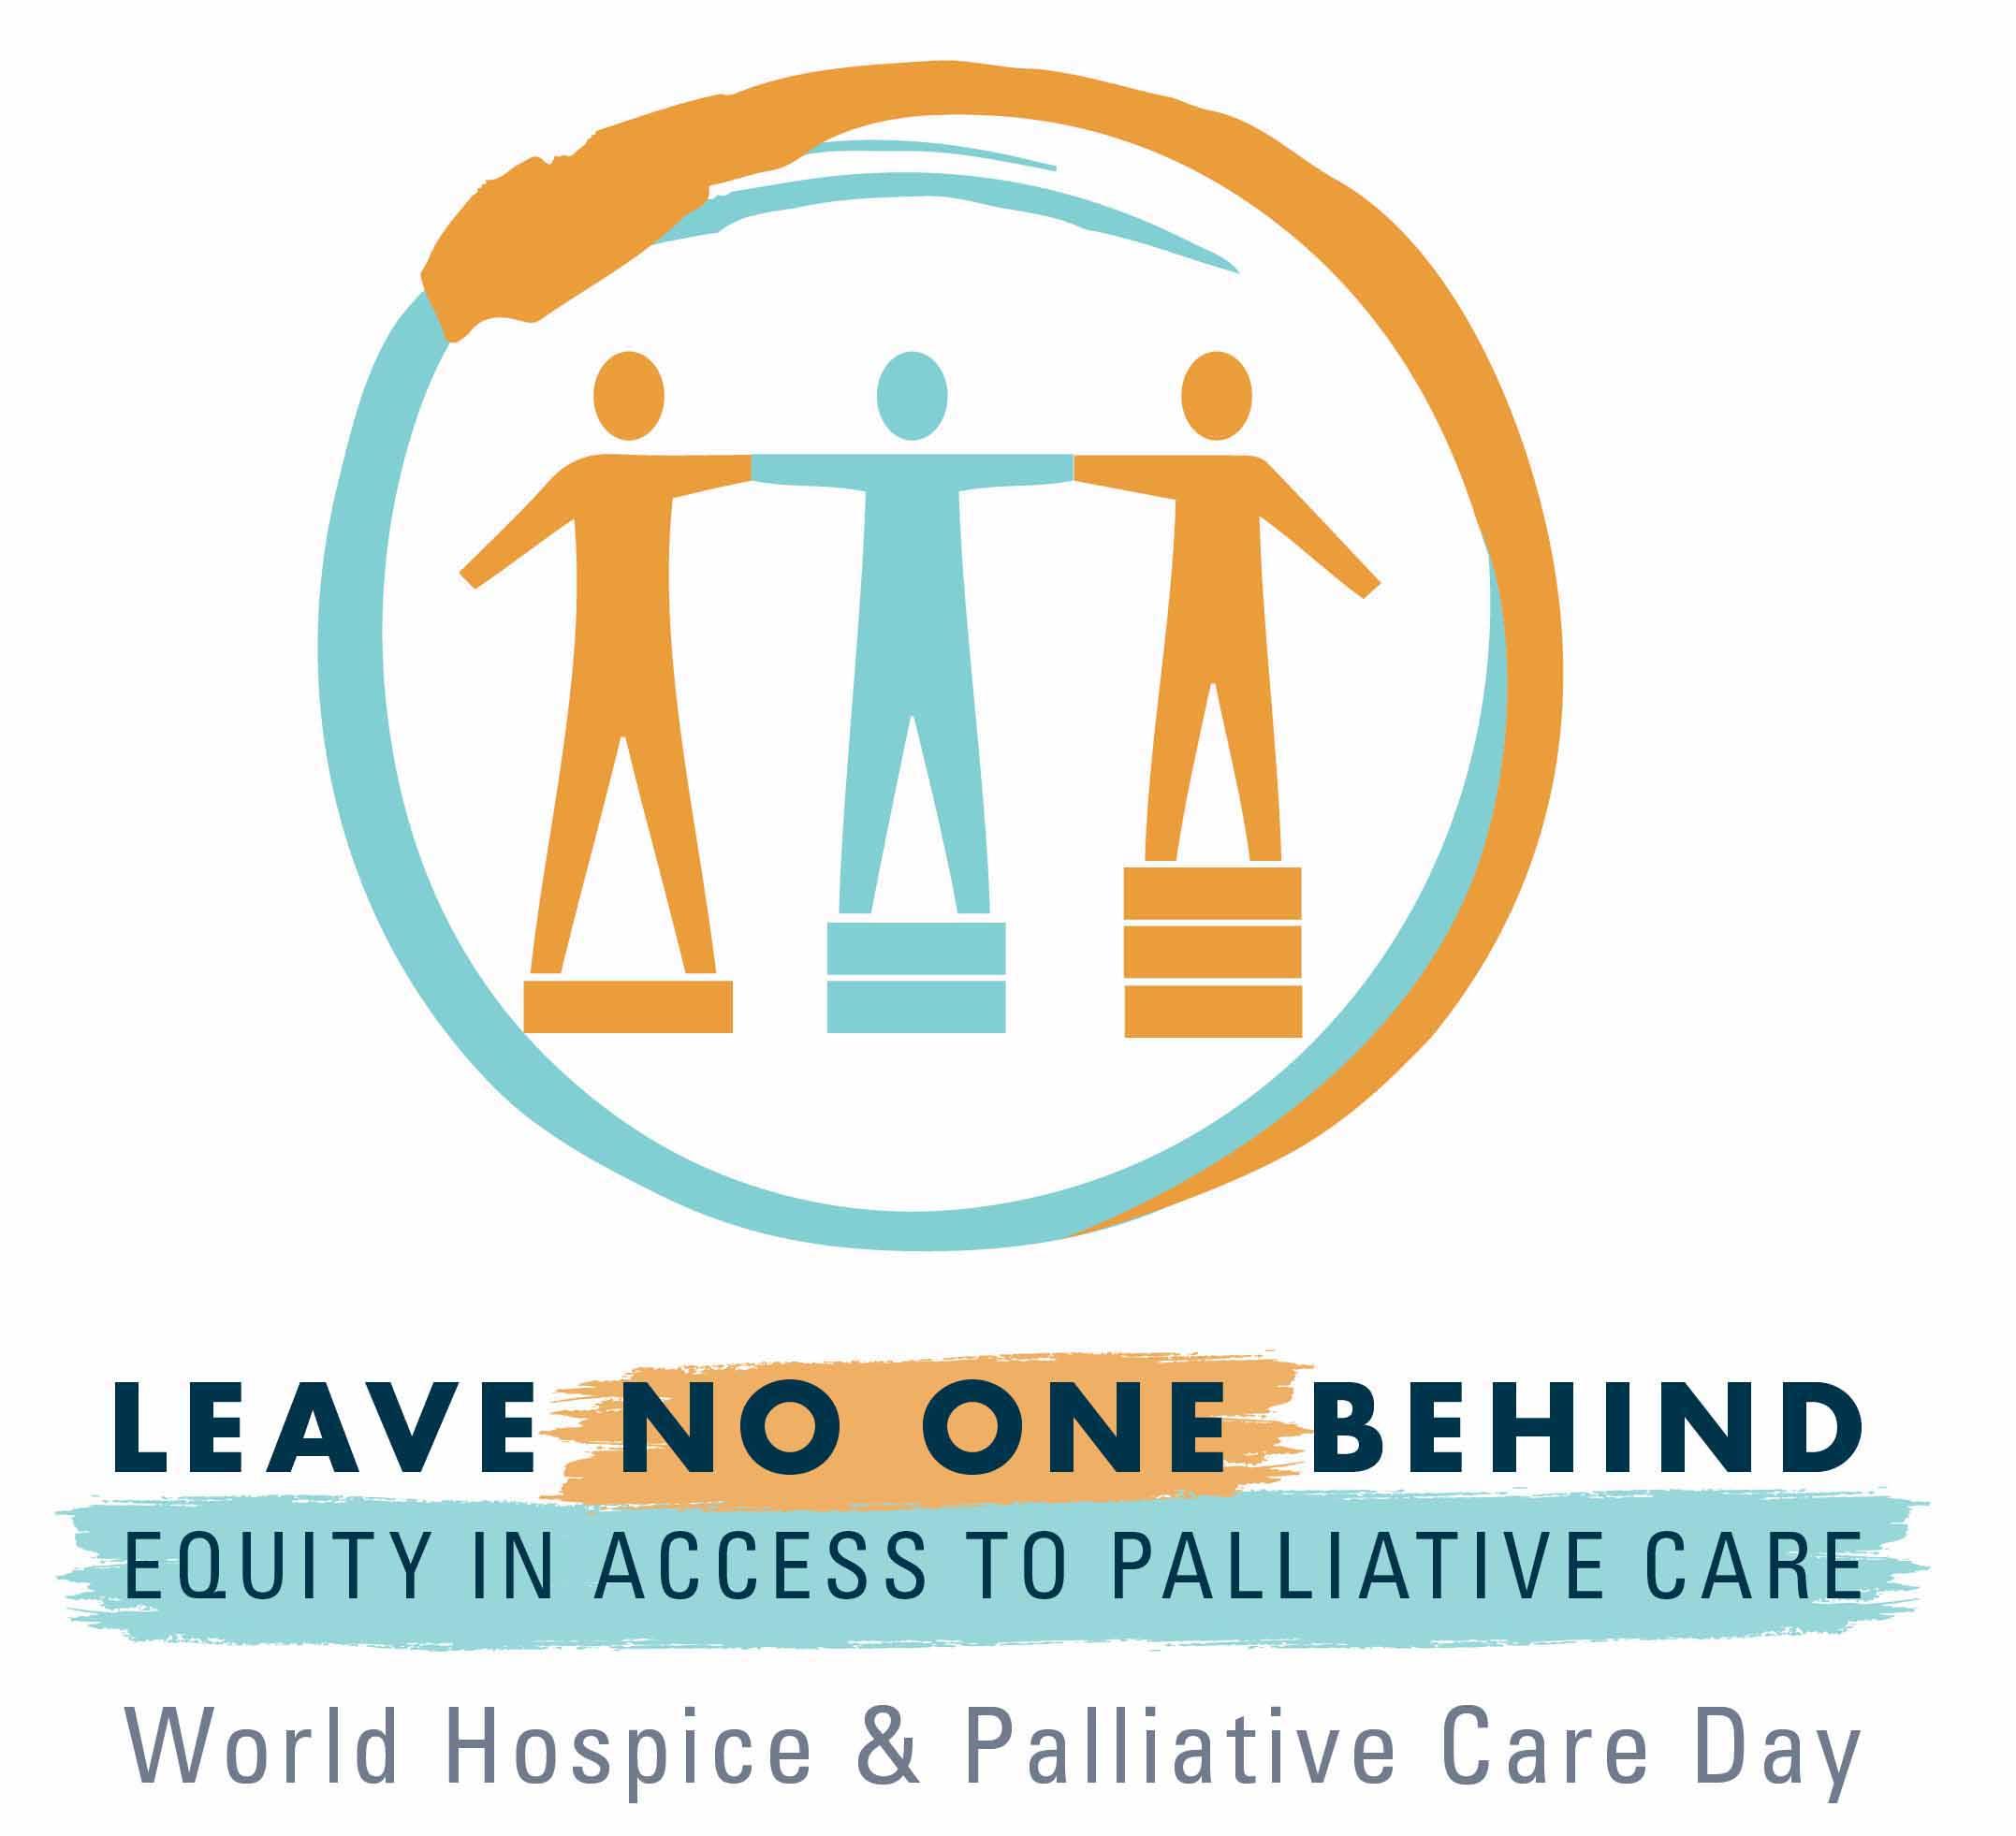 WHPCDLOGO300dpi4.jpg.nodate - Celebrating World Hospice and Palliative Care Day, October 9th